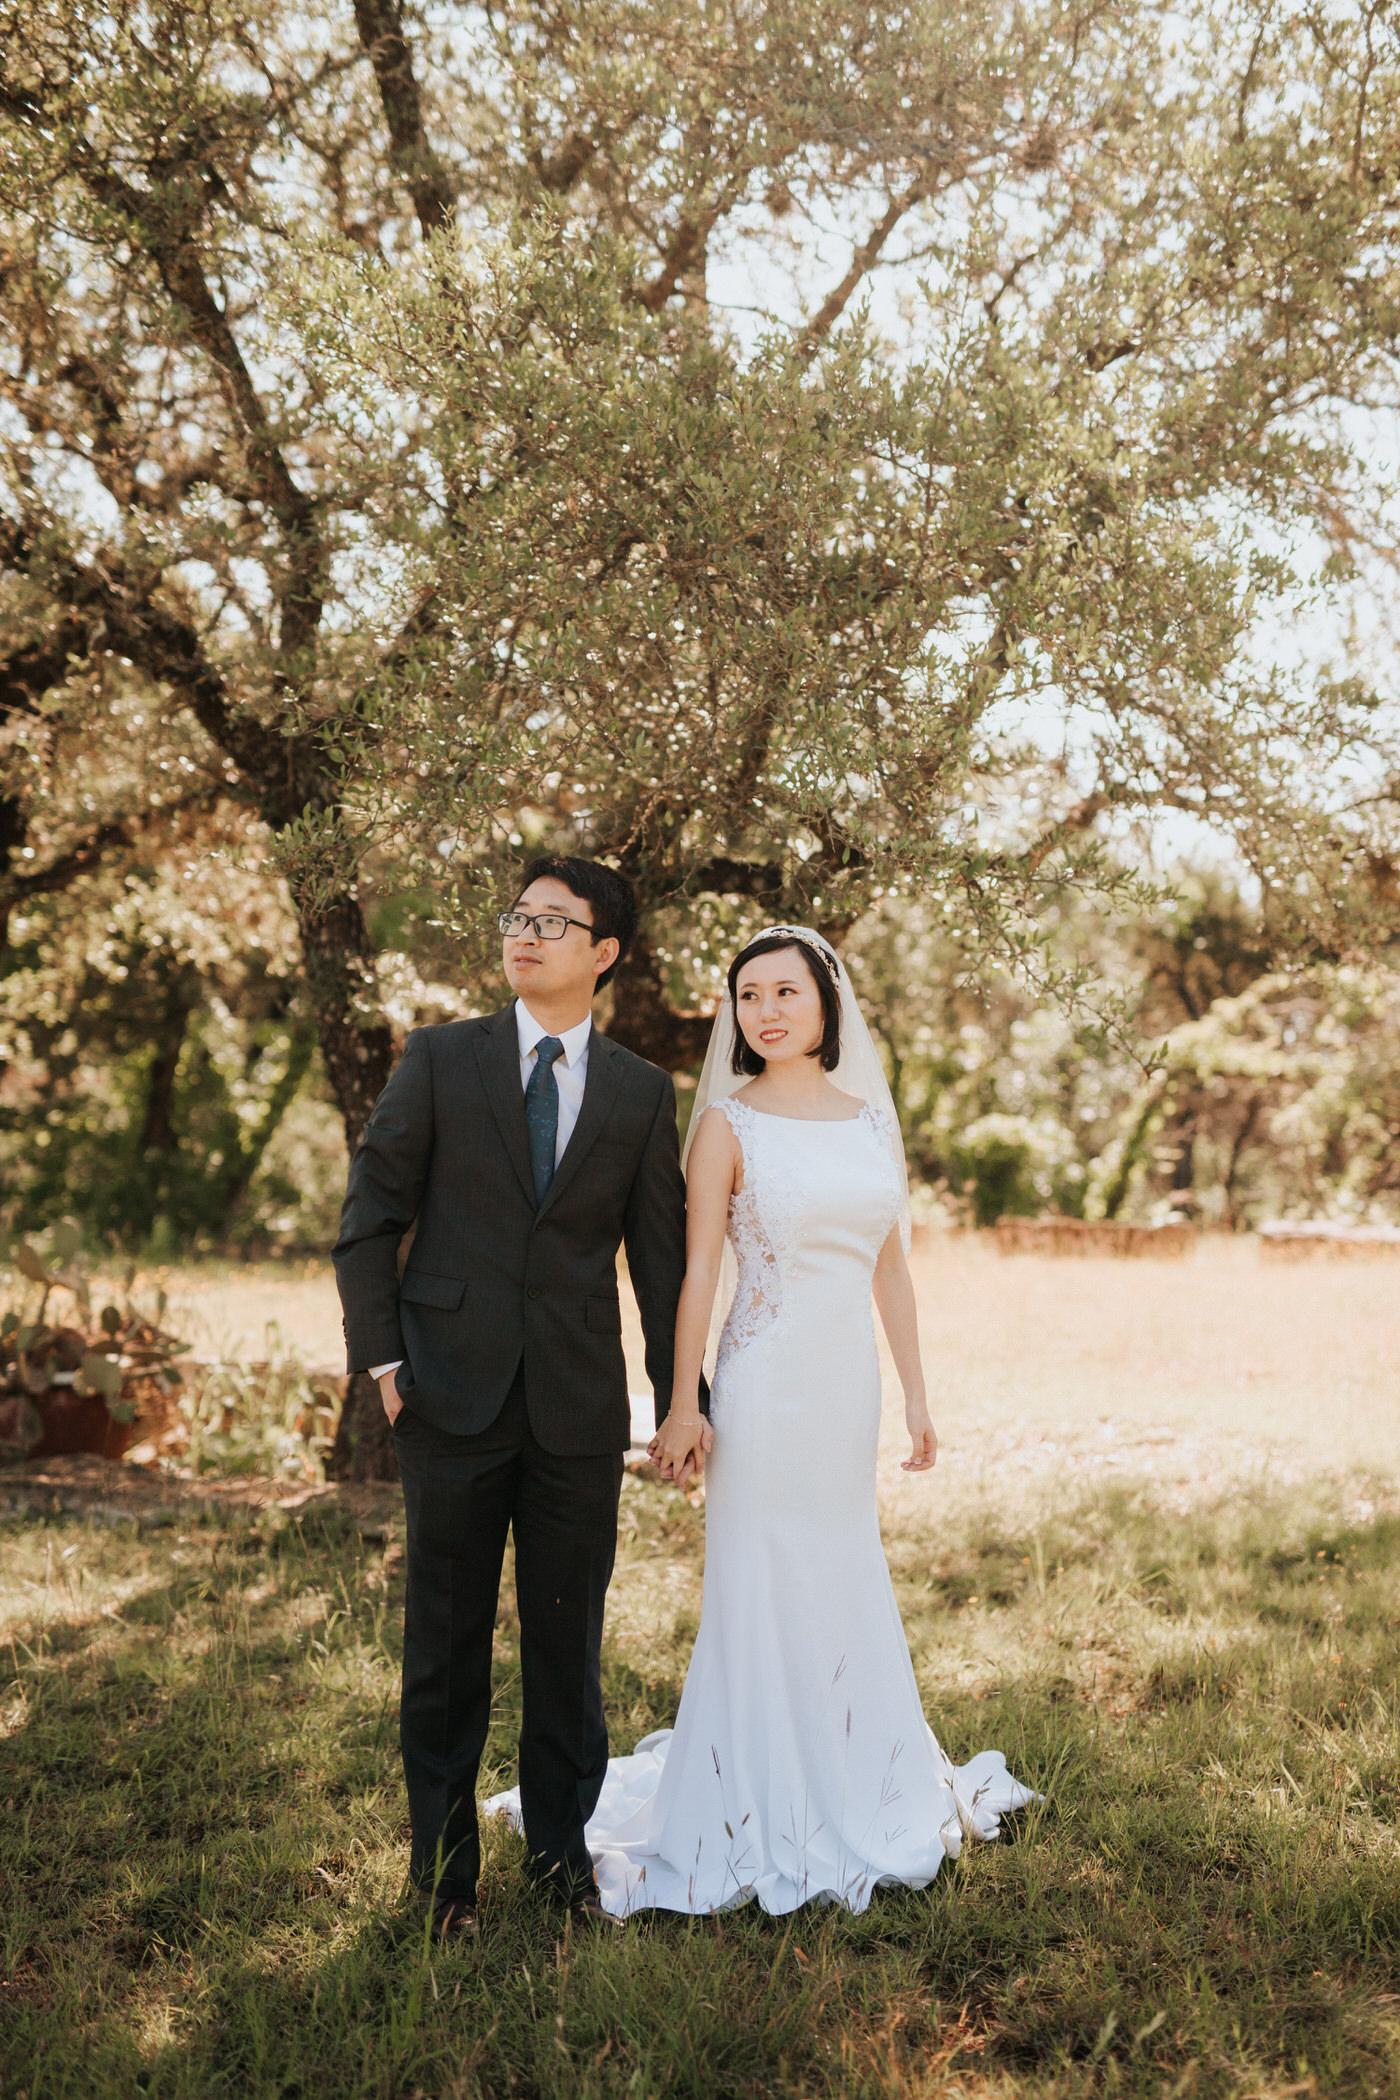 Chapel Dulcinea Wedding - Diana Ascarrrunz Photography -257.jpg